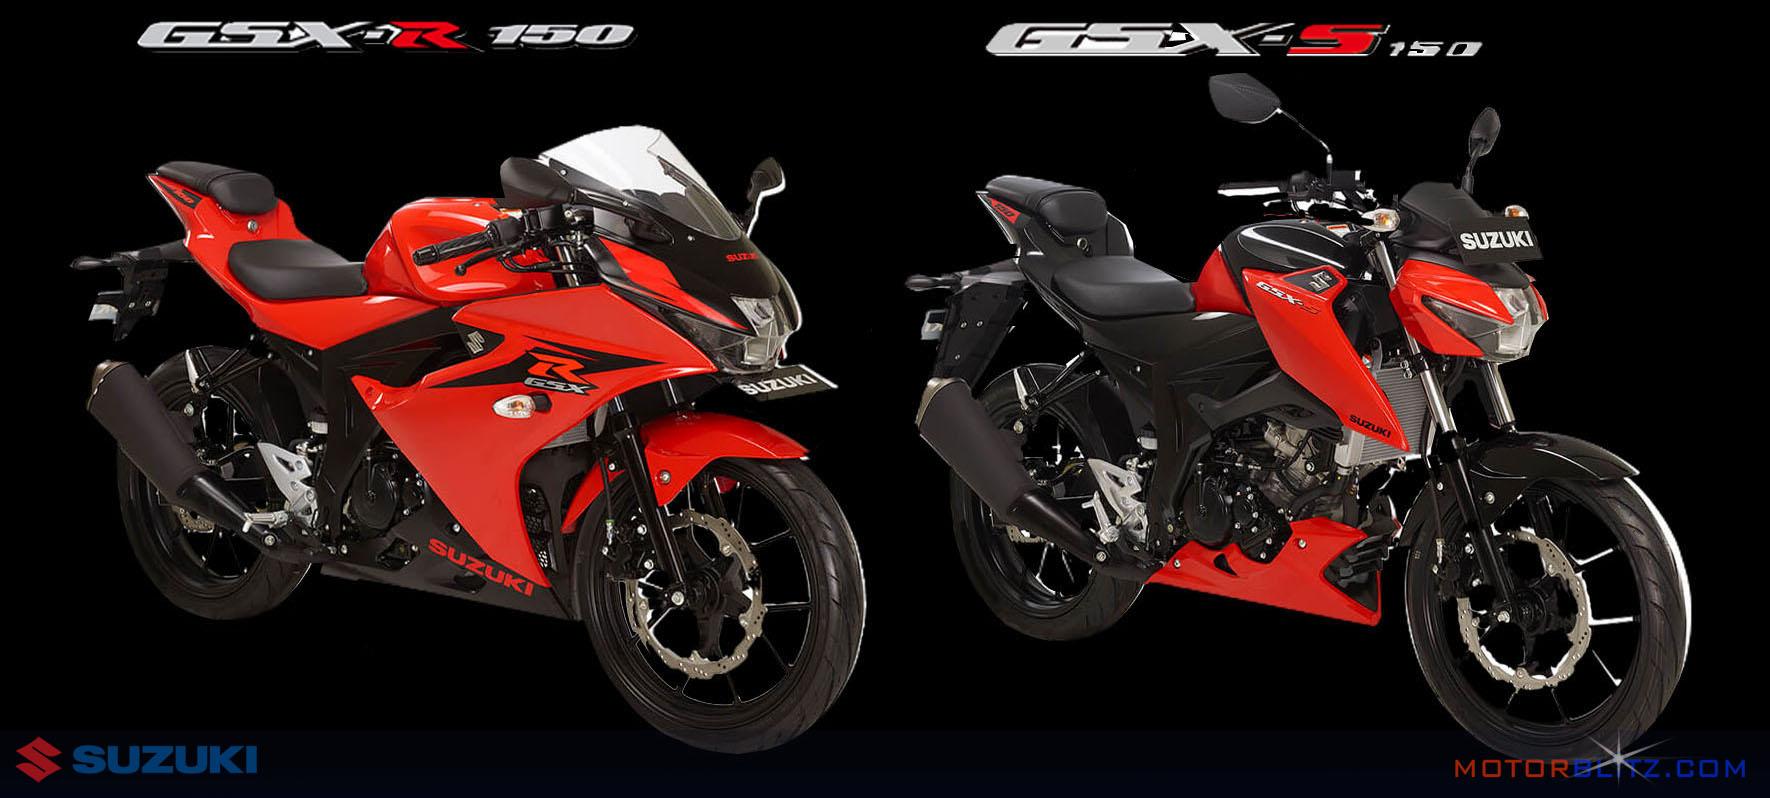 Gsx R150 Dan Gsx S150 Warna Merah Motorblitz